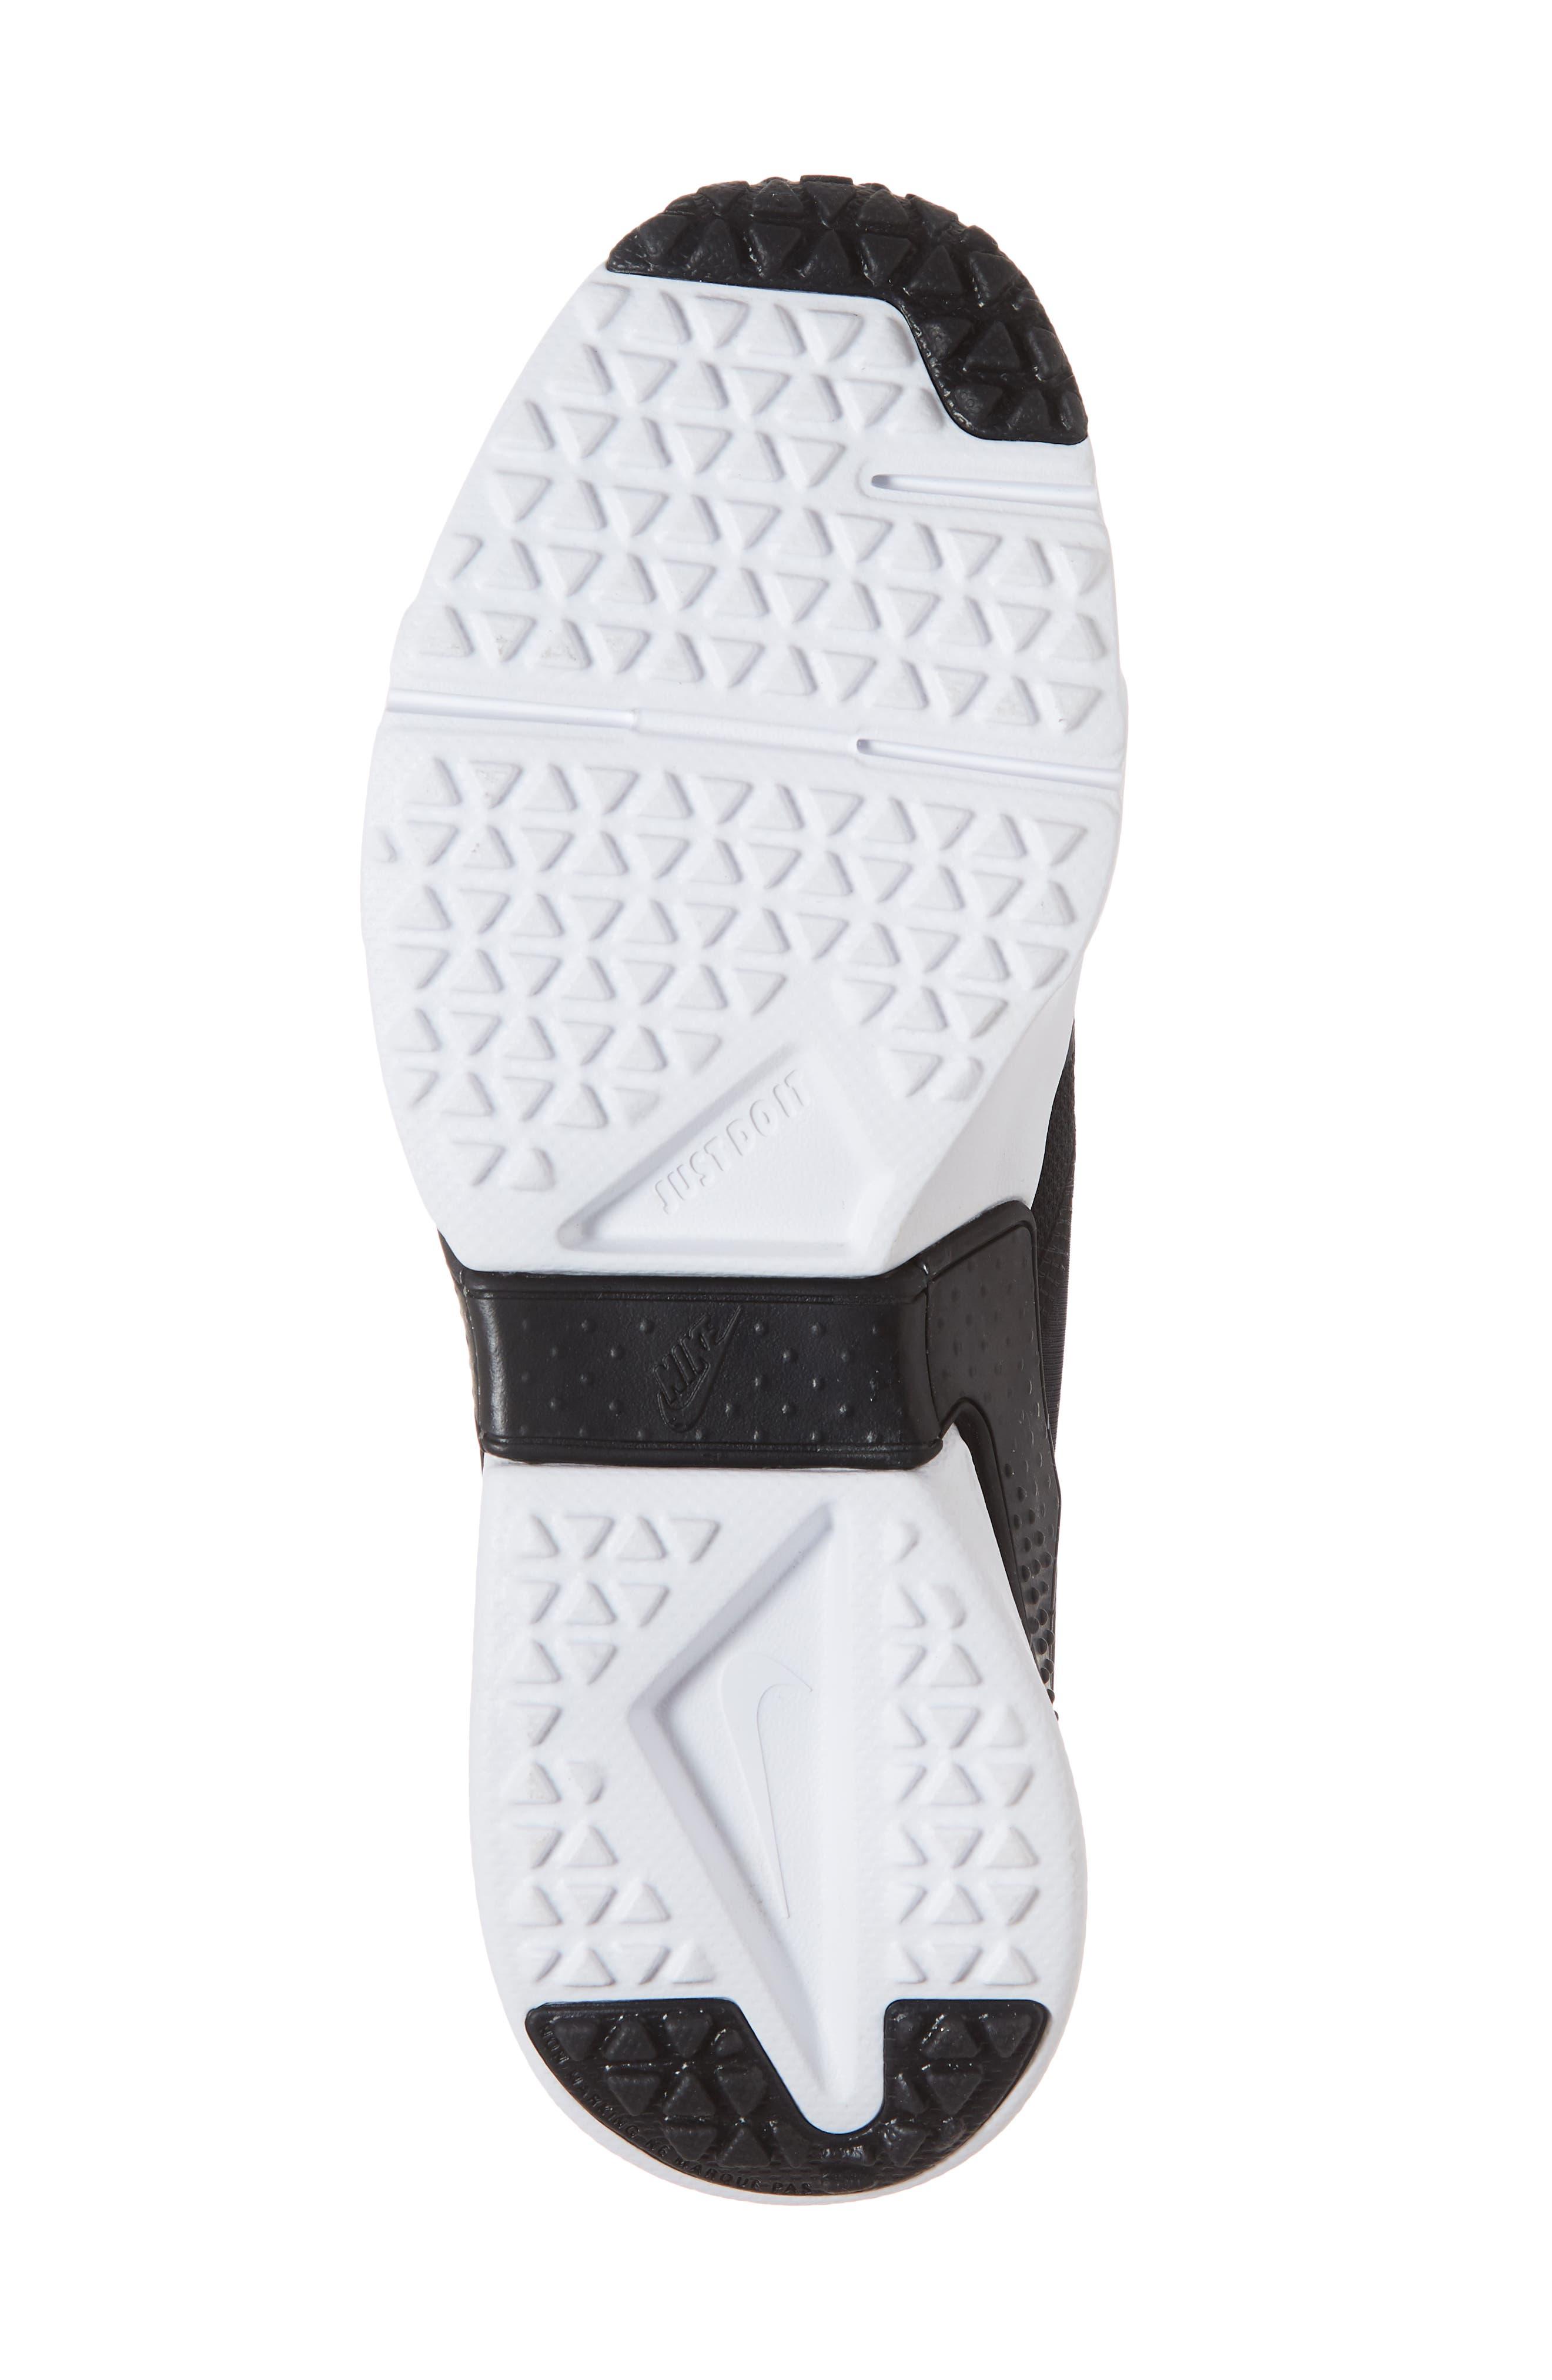 Huarache Run Drift Sneaker,                             Alternate thumbnail 7, color,                             Black/ Anthracite